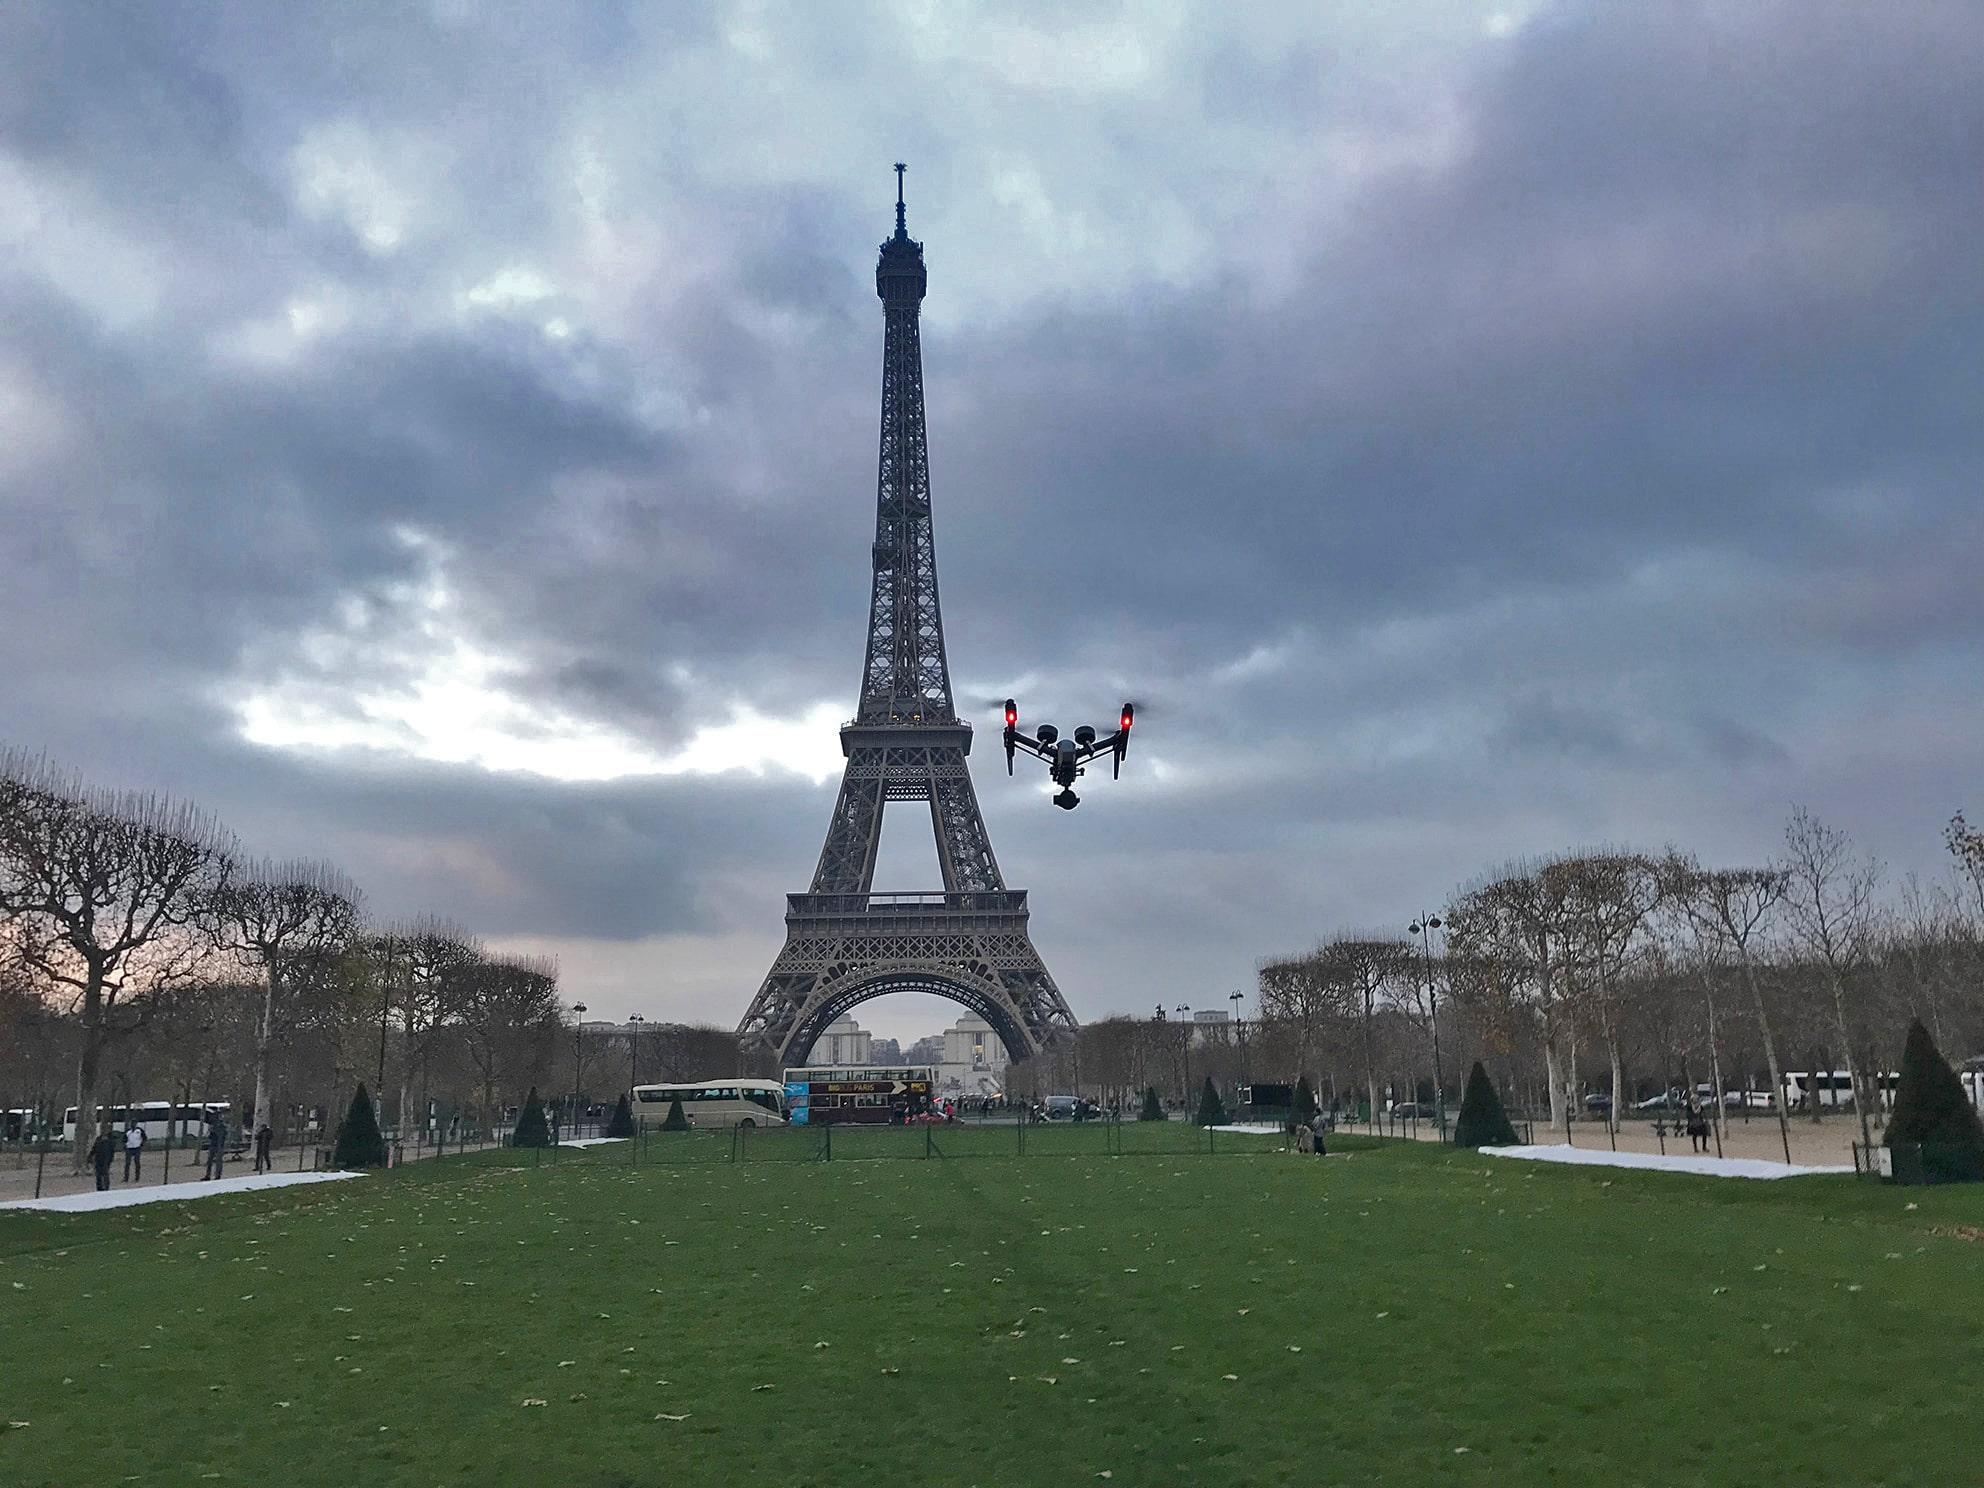 dronex pro tutorial